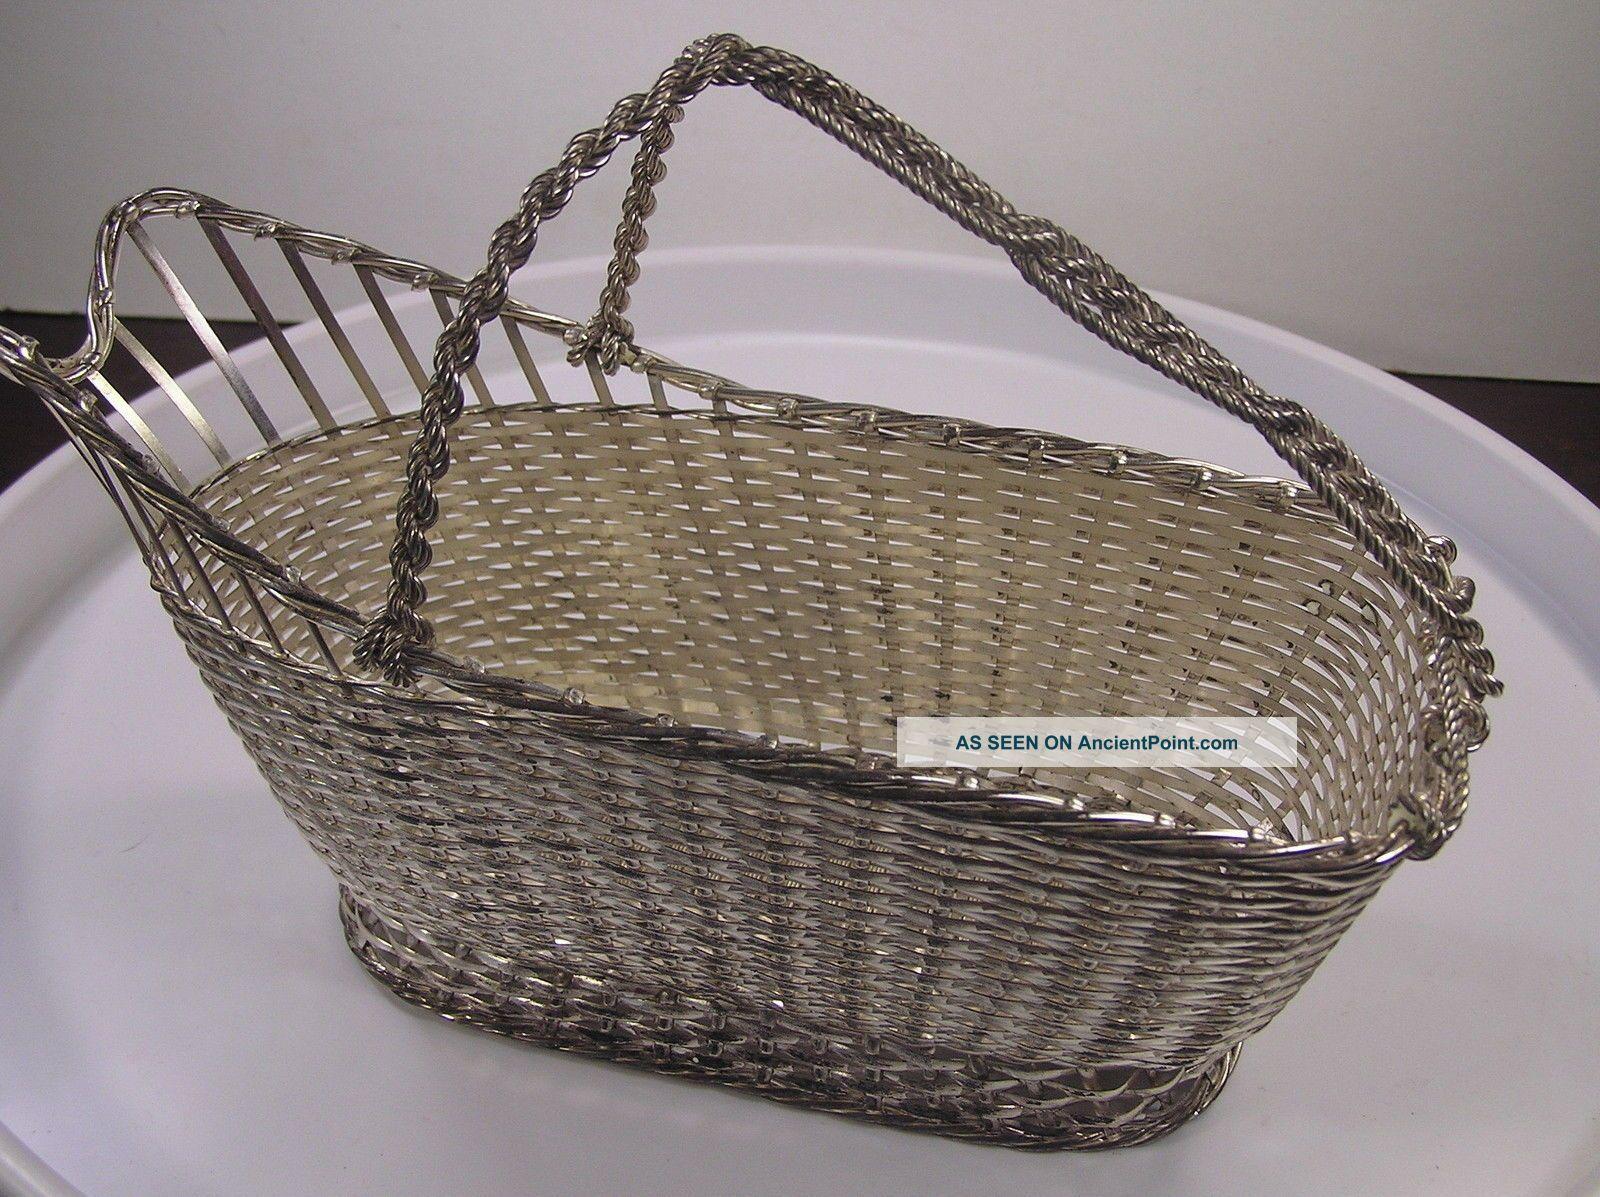 Christofle Vannerie Silver Plate Woven Wine Basket Caddy Panier à Vin Baskets photo